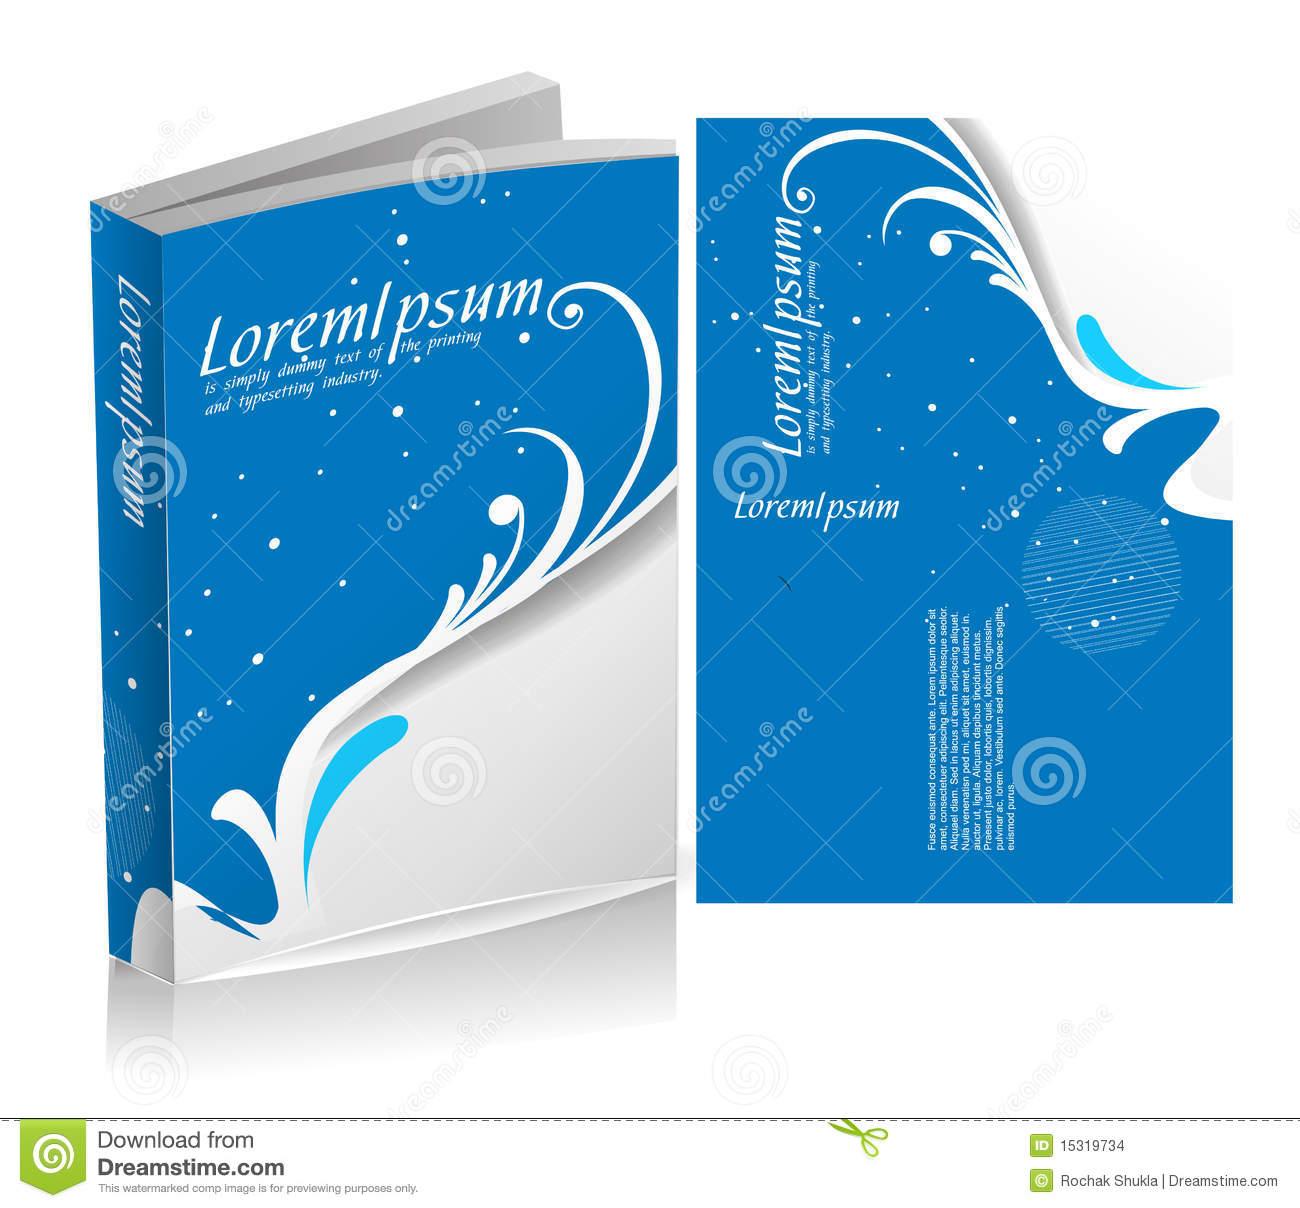 book cover designing - Book Cover Design Ideas